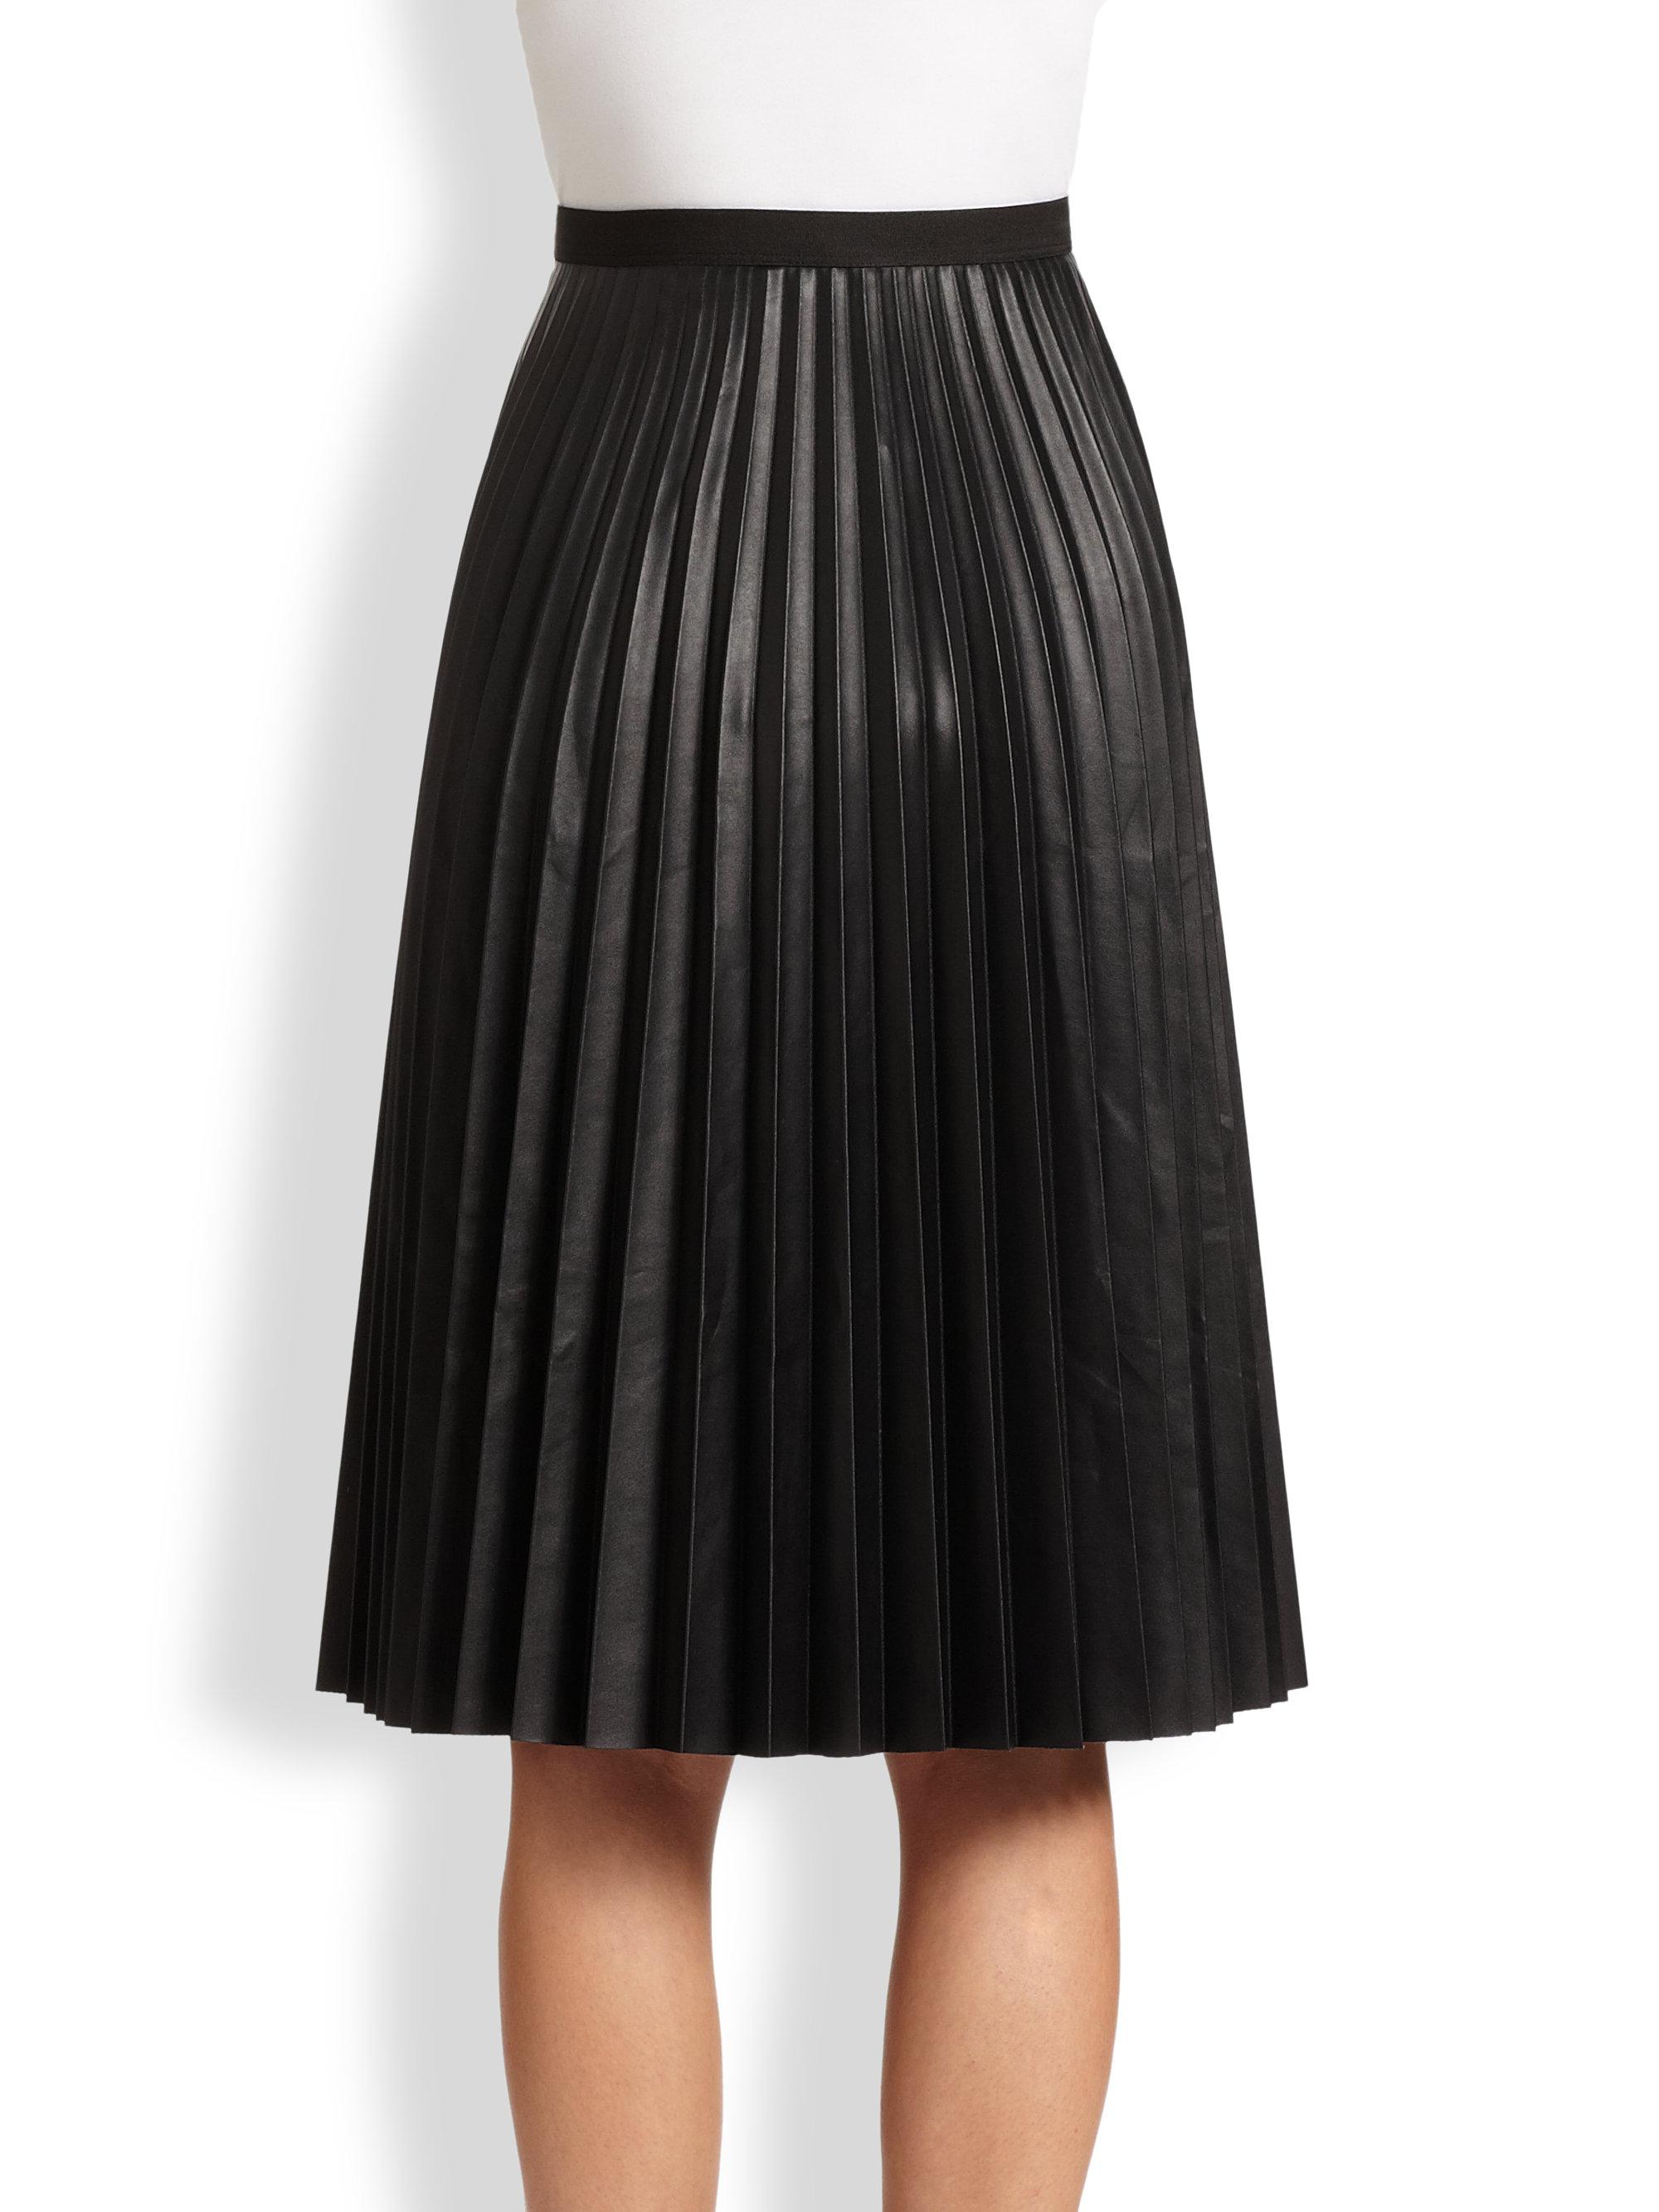 85c28a7973 BCBGMAXAZRIA Elsa Faux Leather Pleated Skirt in Black - Lyst